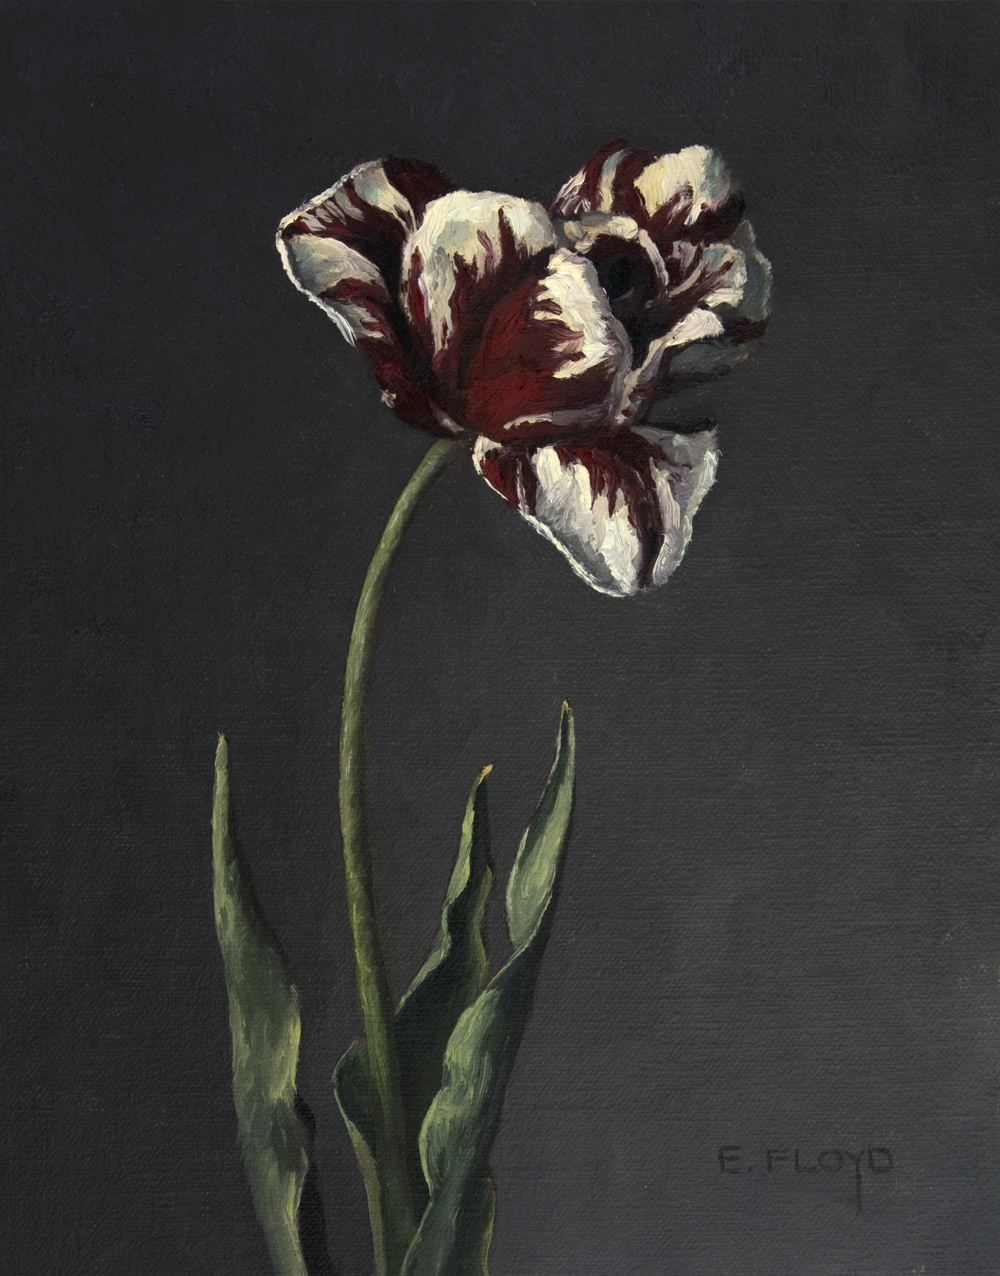 20150423-005-Rembrandt-Tulip-10x8-copy.jpg